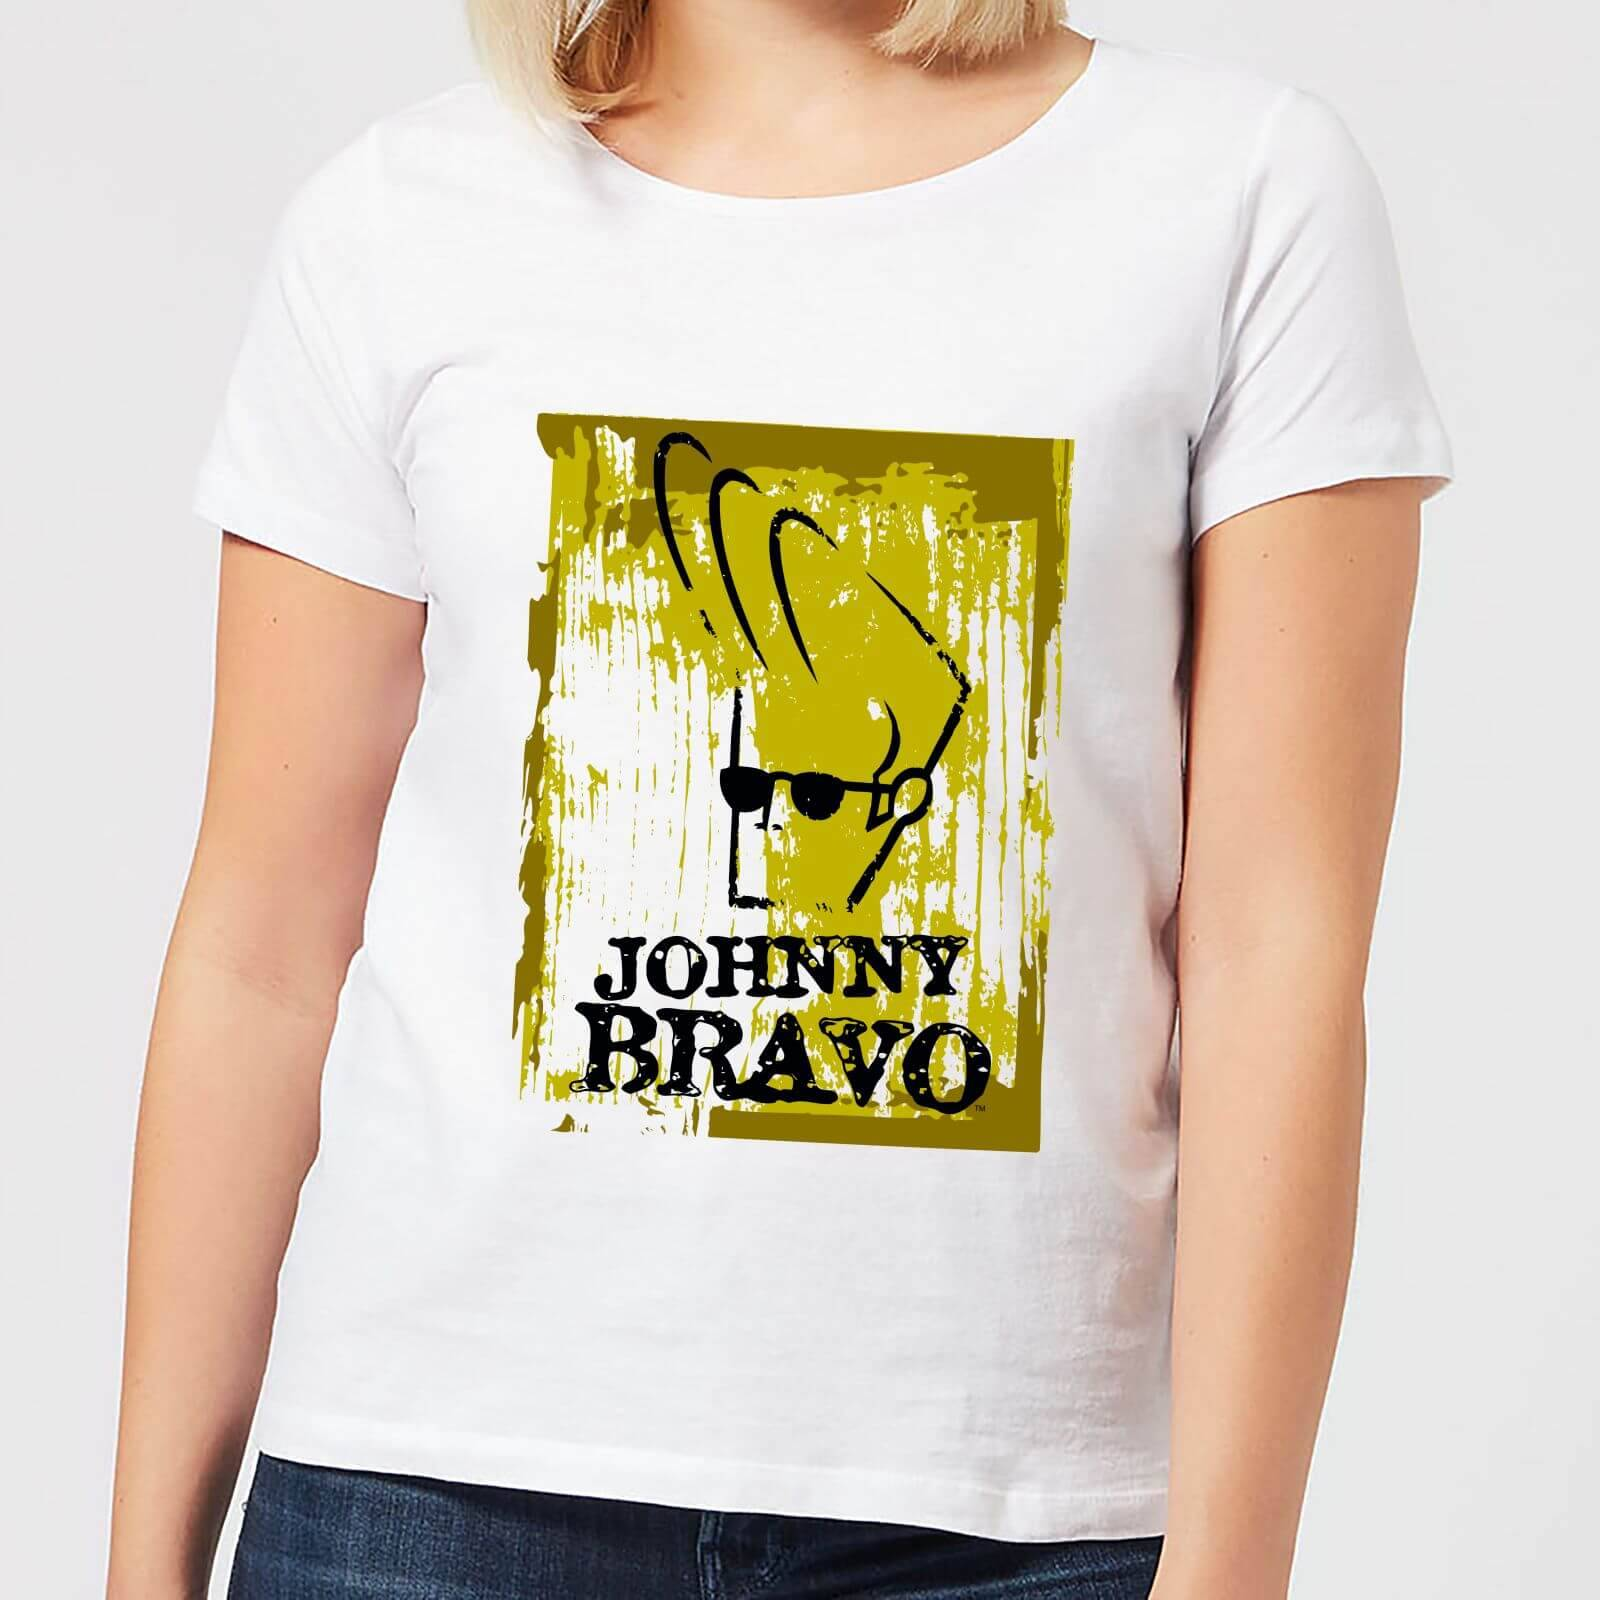 Cartoon Network Johnny Bravo Distressed Women's T-Shirt - White - M - White